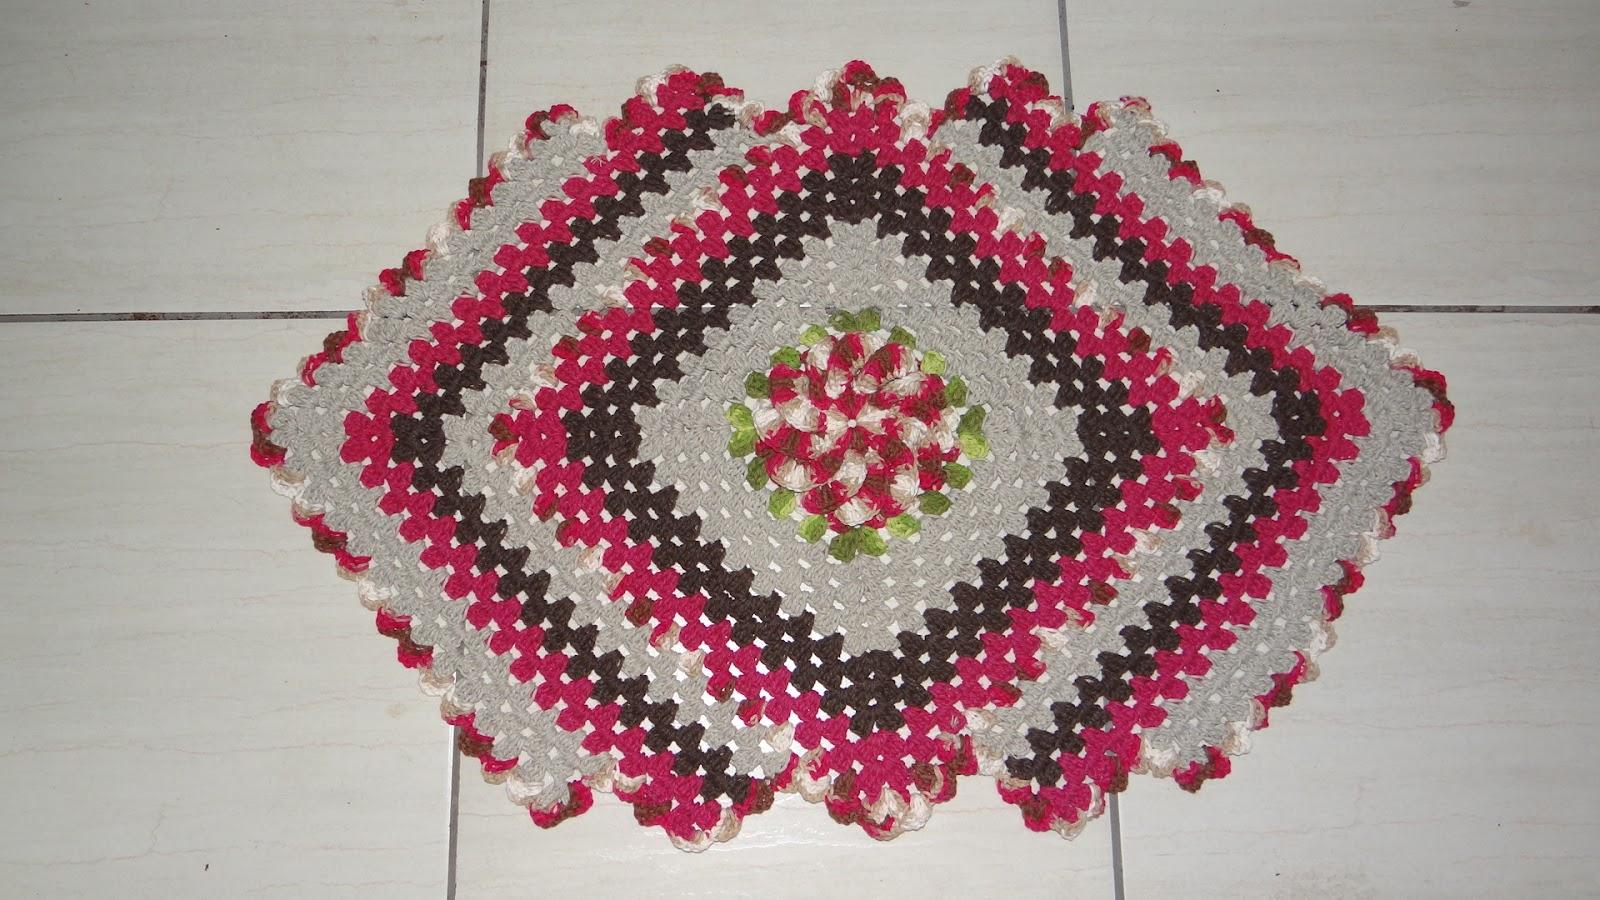 Do Vaso Em Croche Jogo De Banheiro Barbante Hd Wallpapers Pictures #AA2149 1600 900